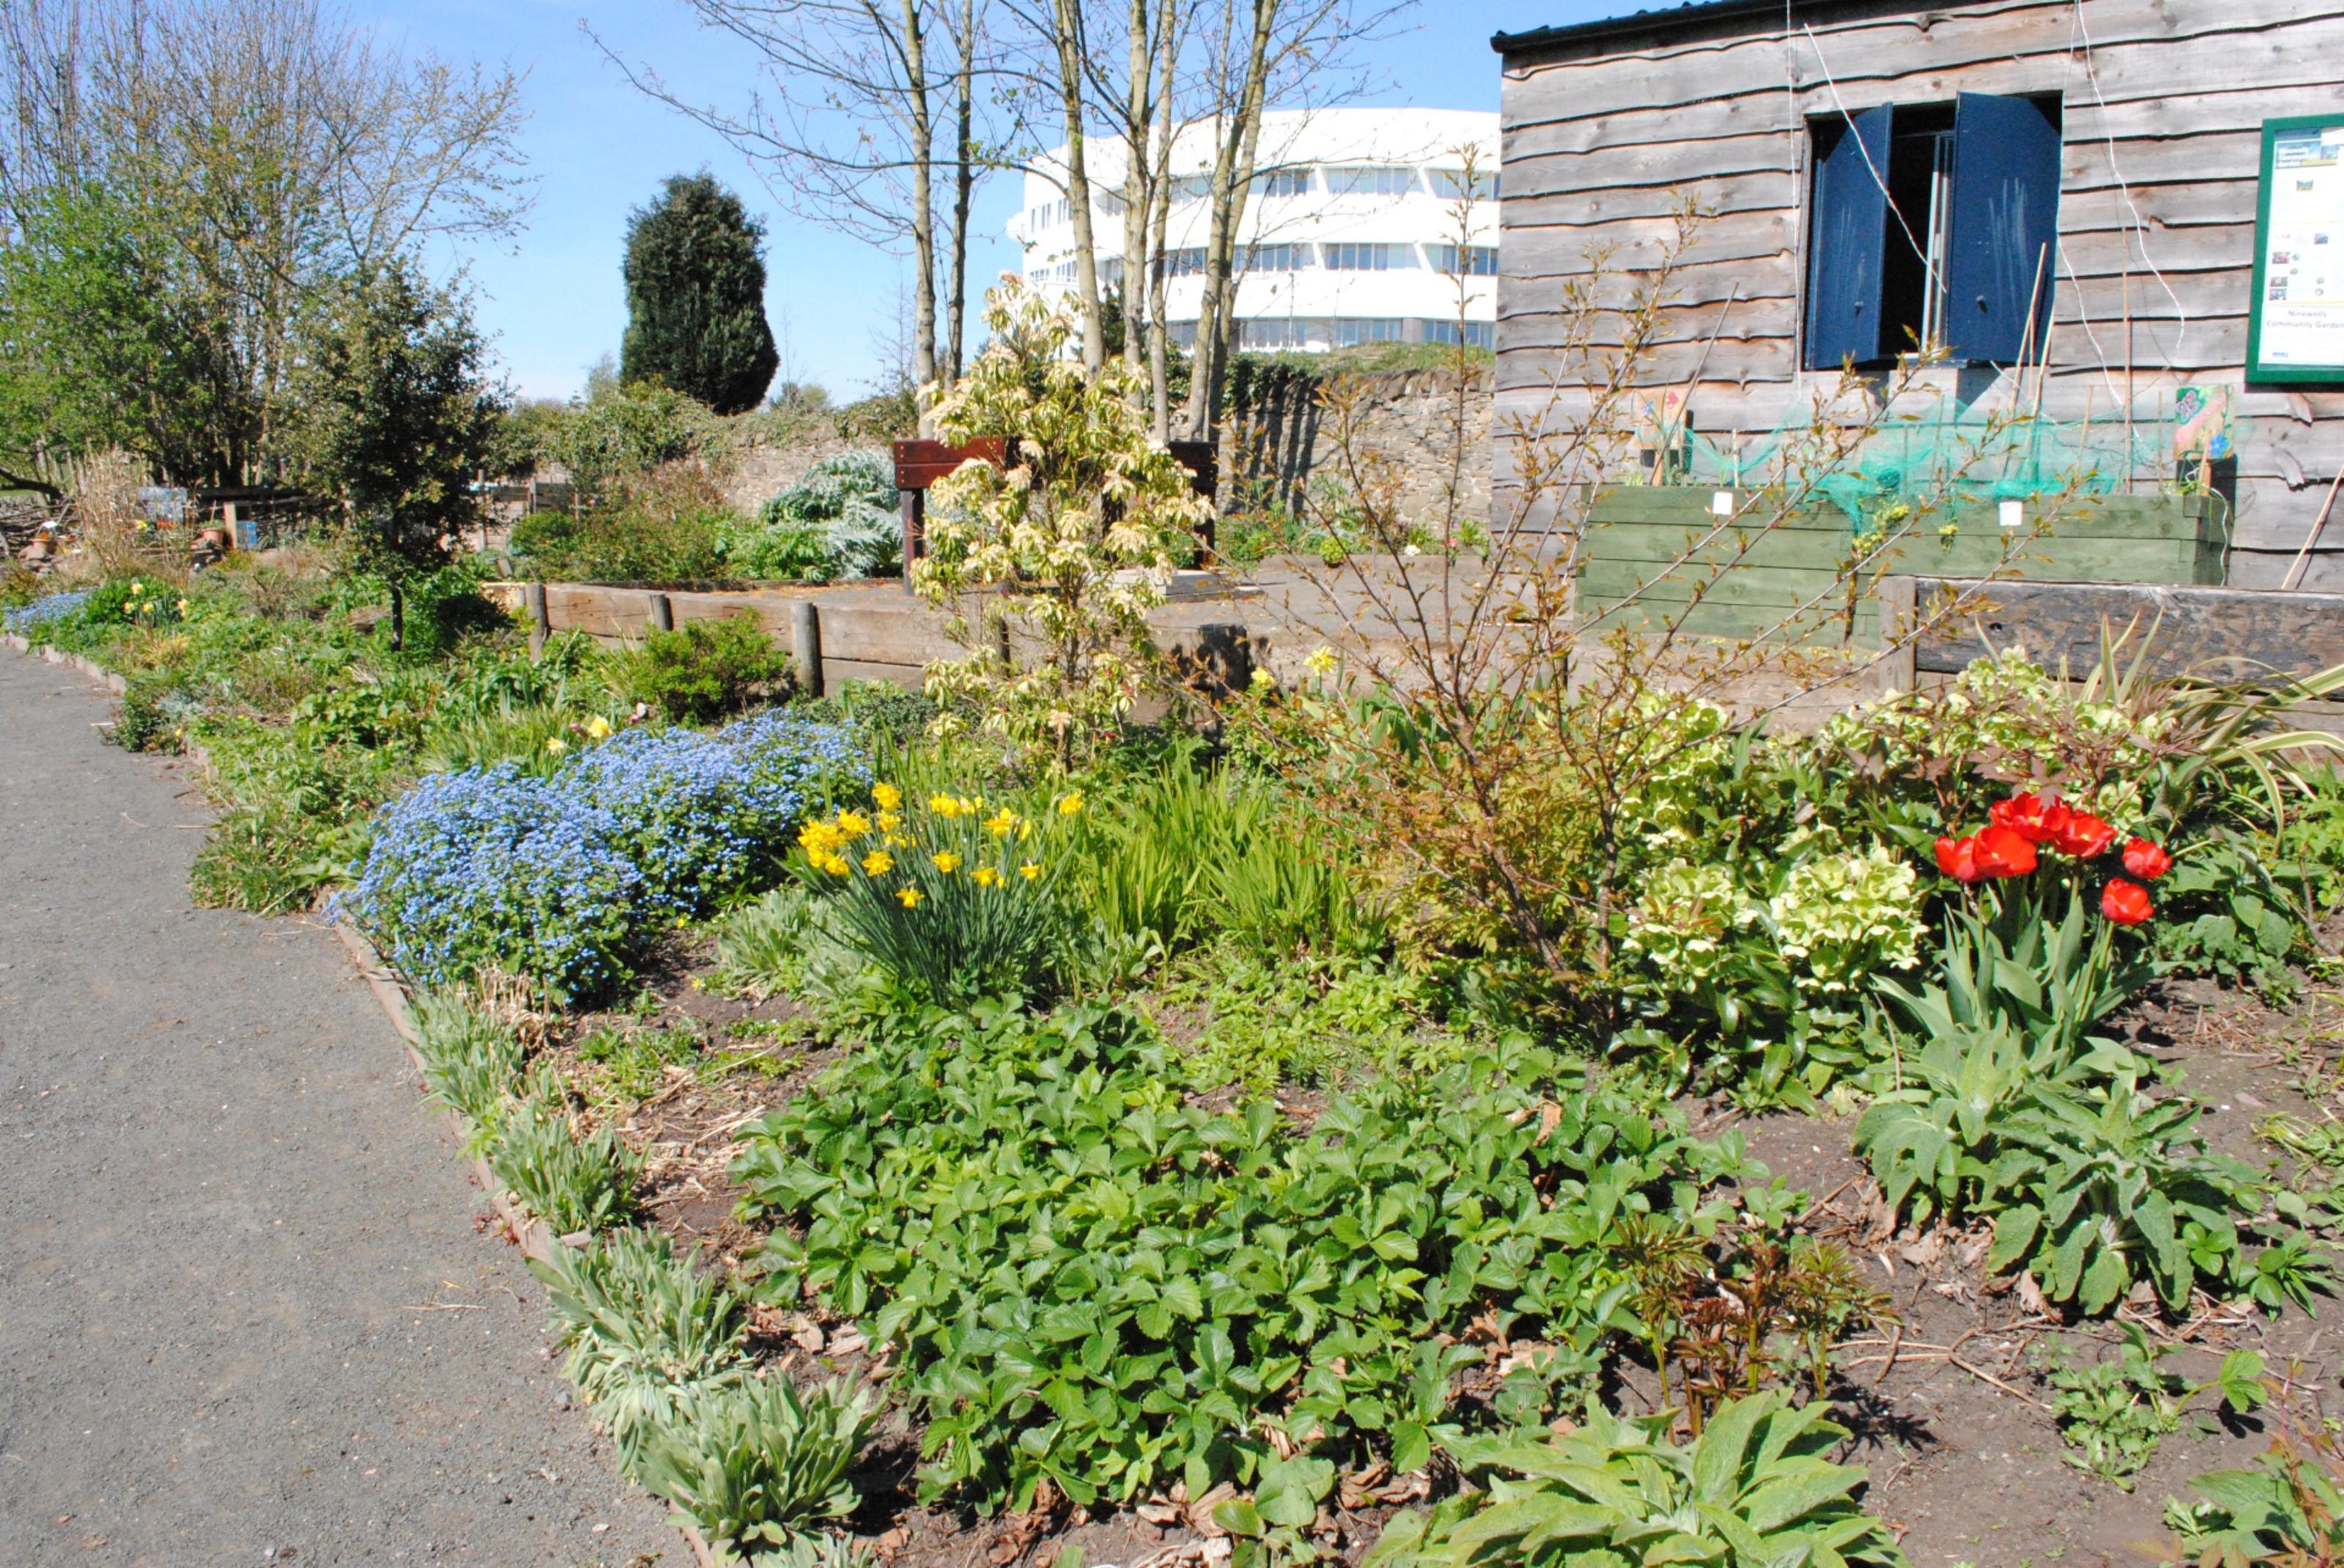 The Ninewells Community Garden